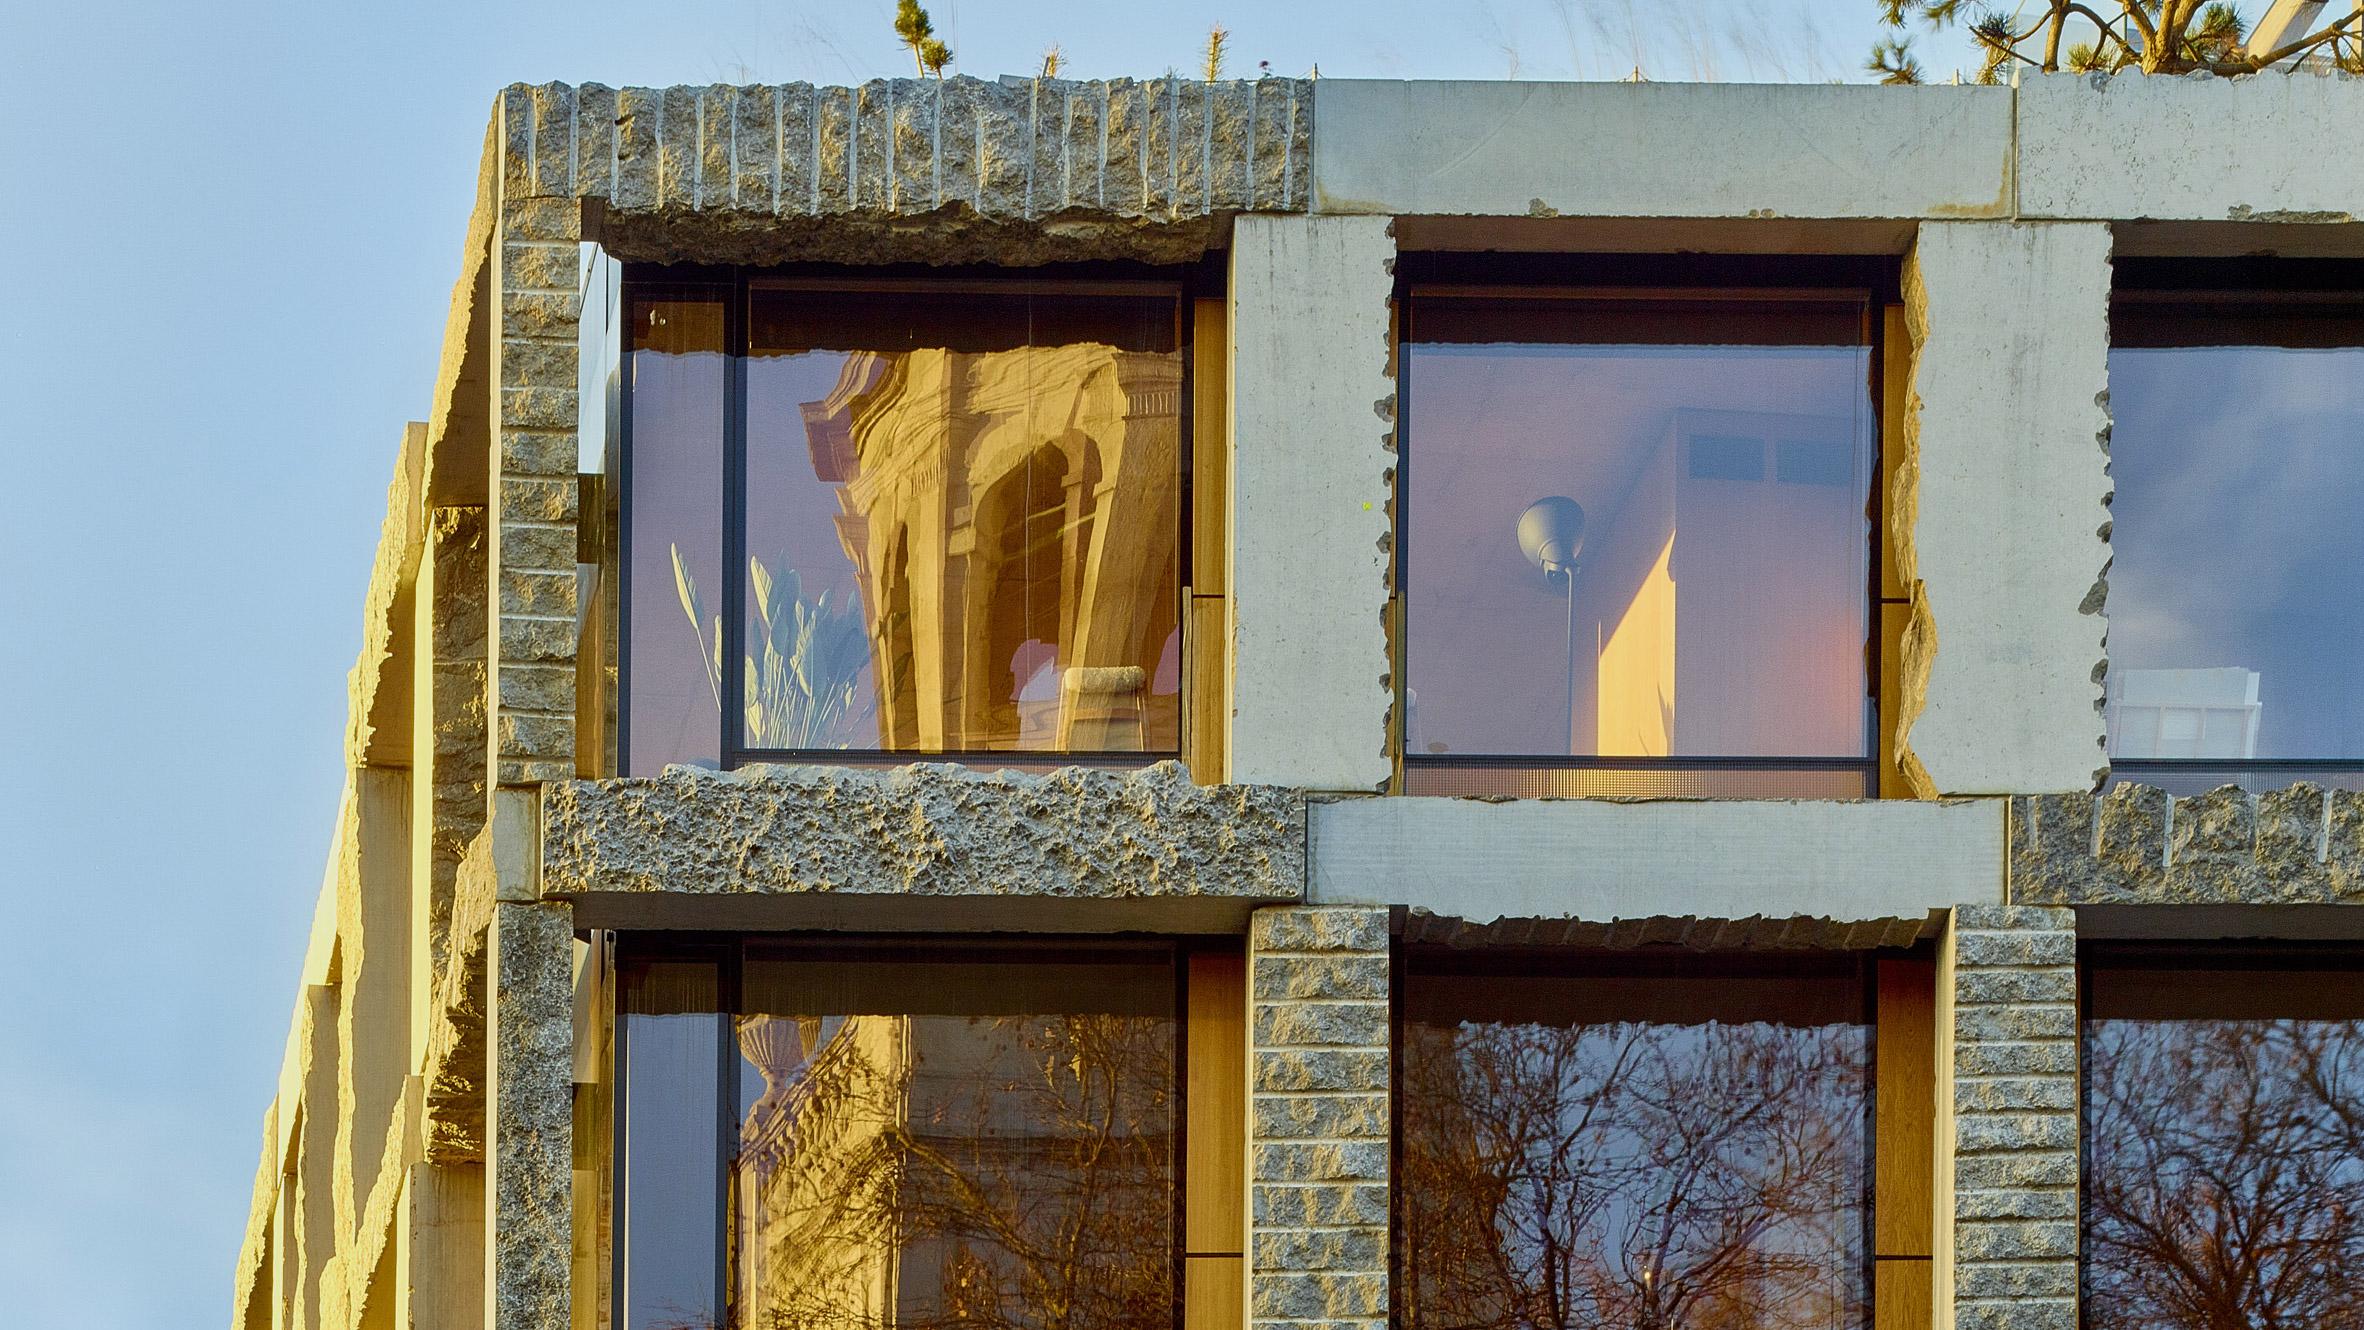 15 Clerkenwell Close, London, UK, by Groupwork + Amin Taha